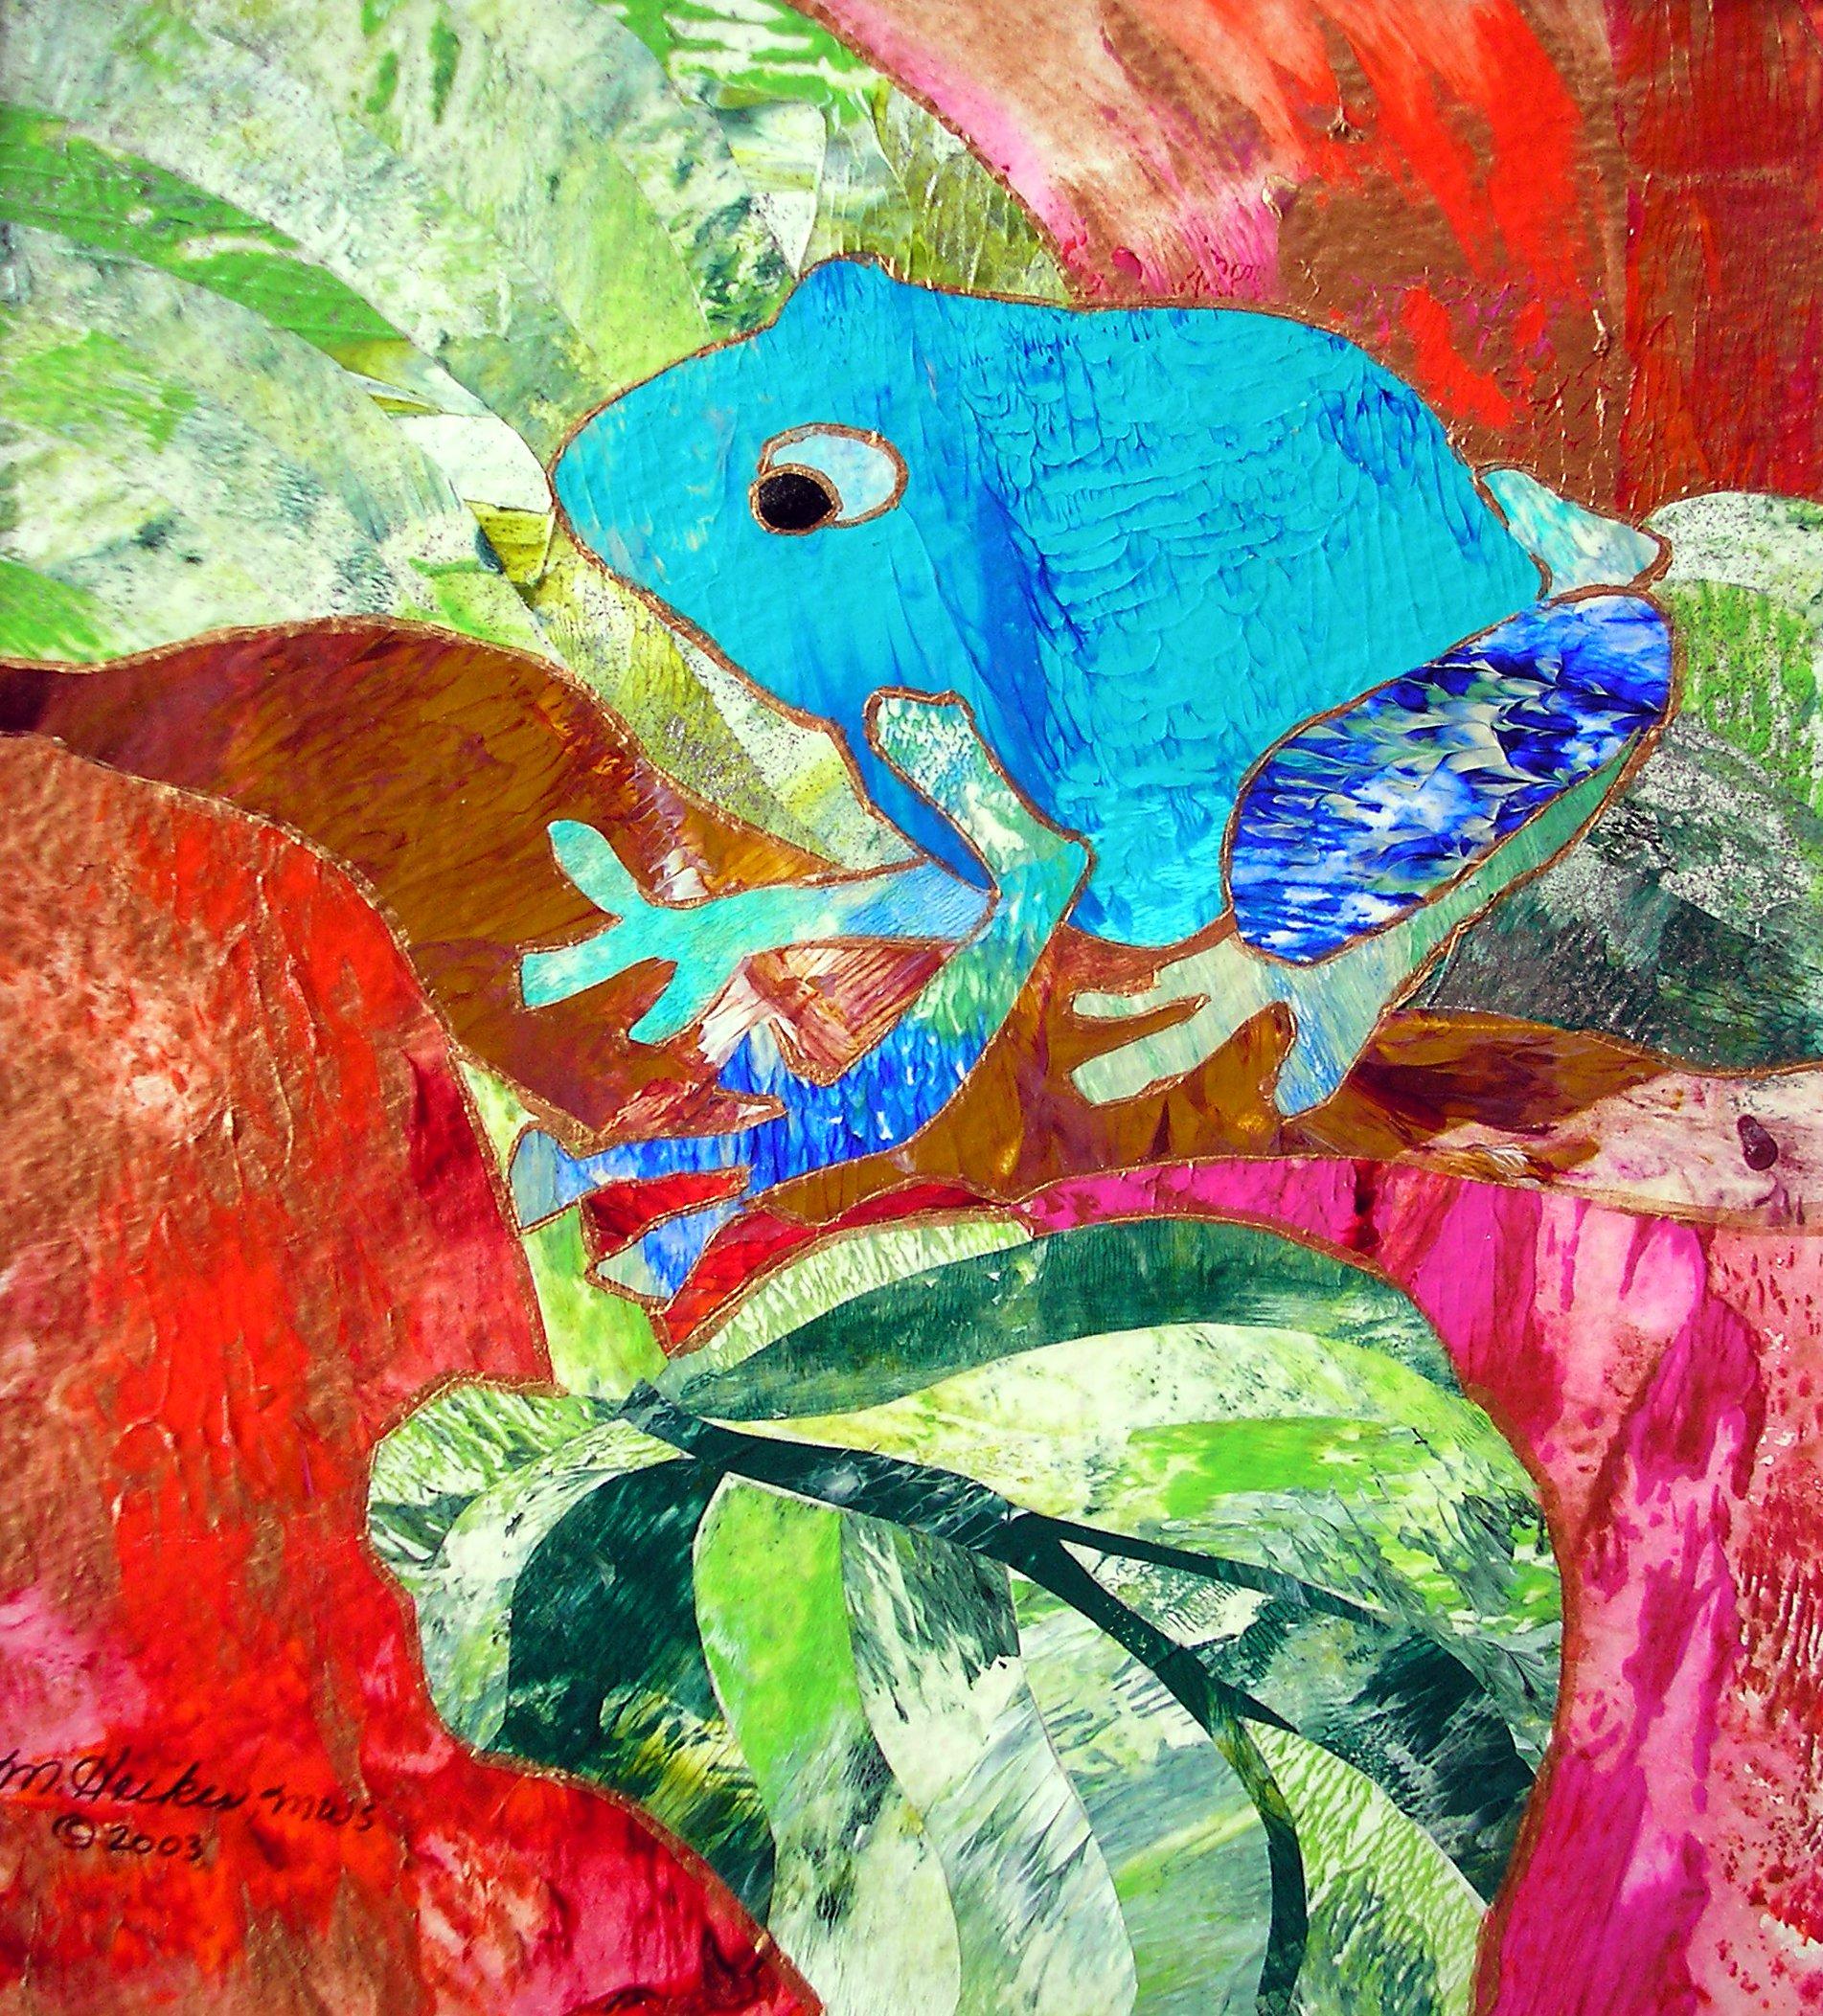 Teal Frog